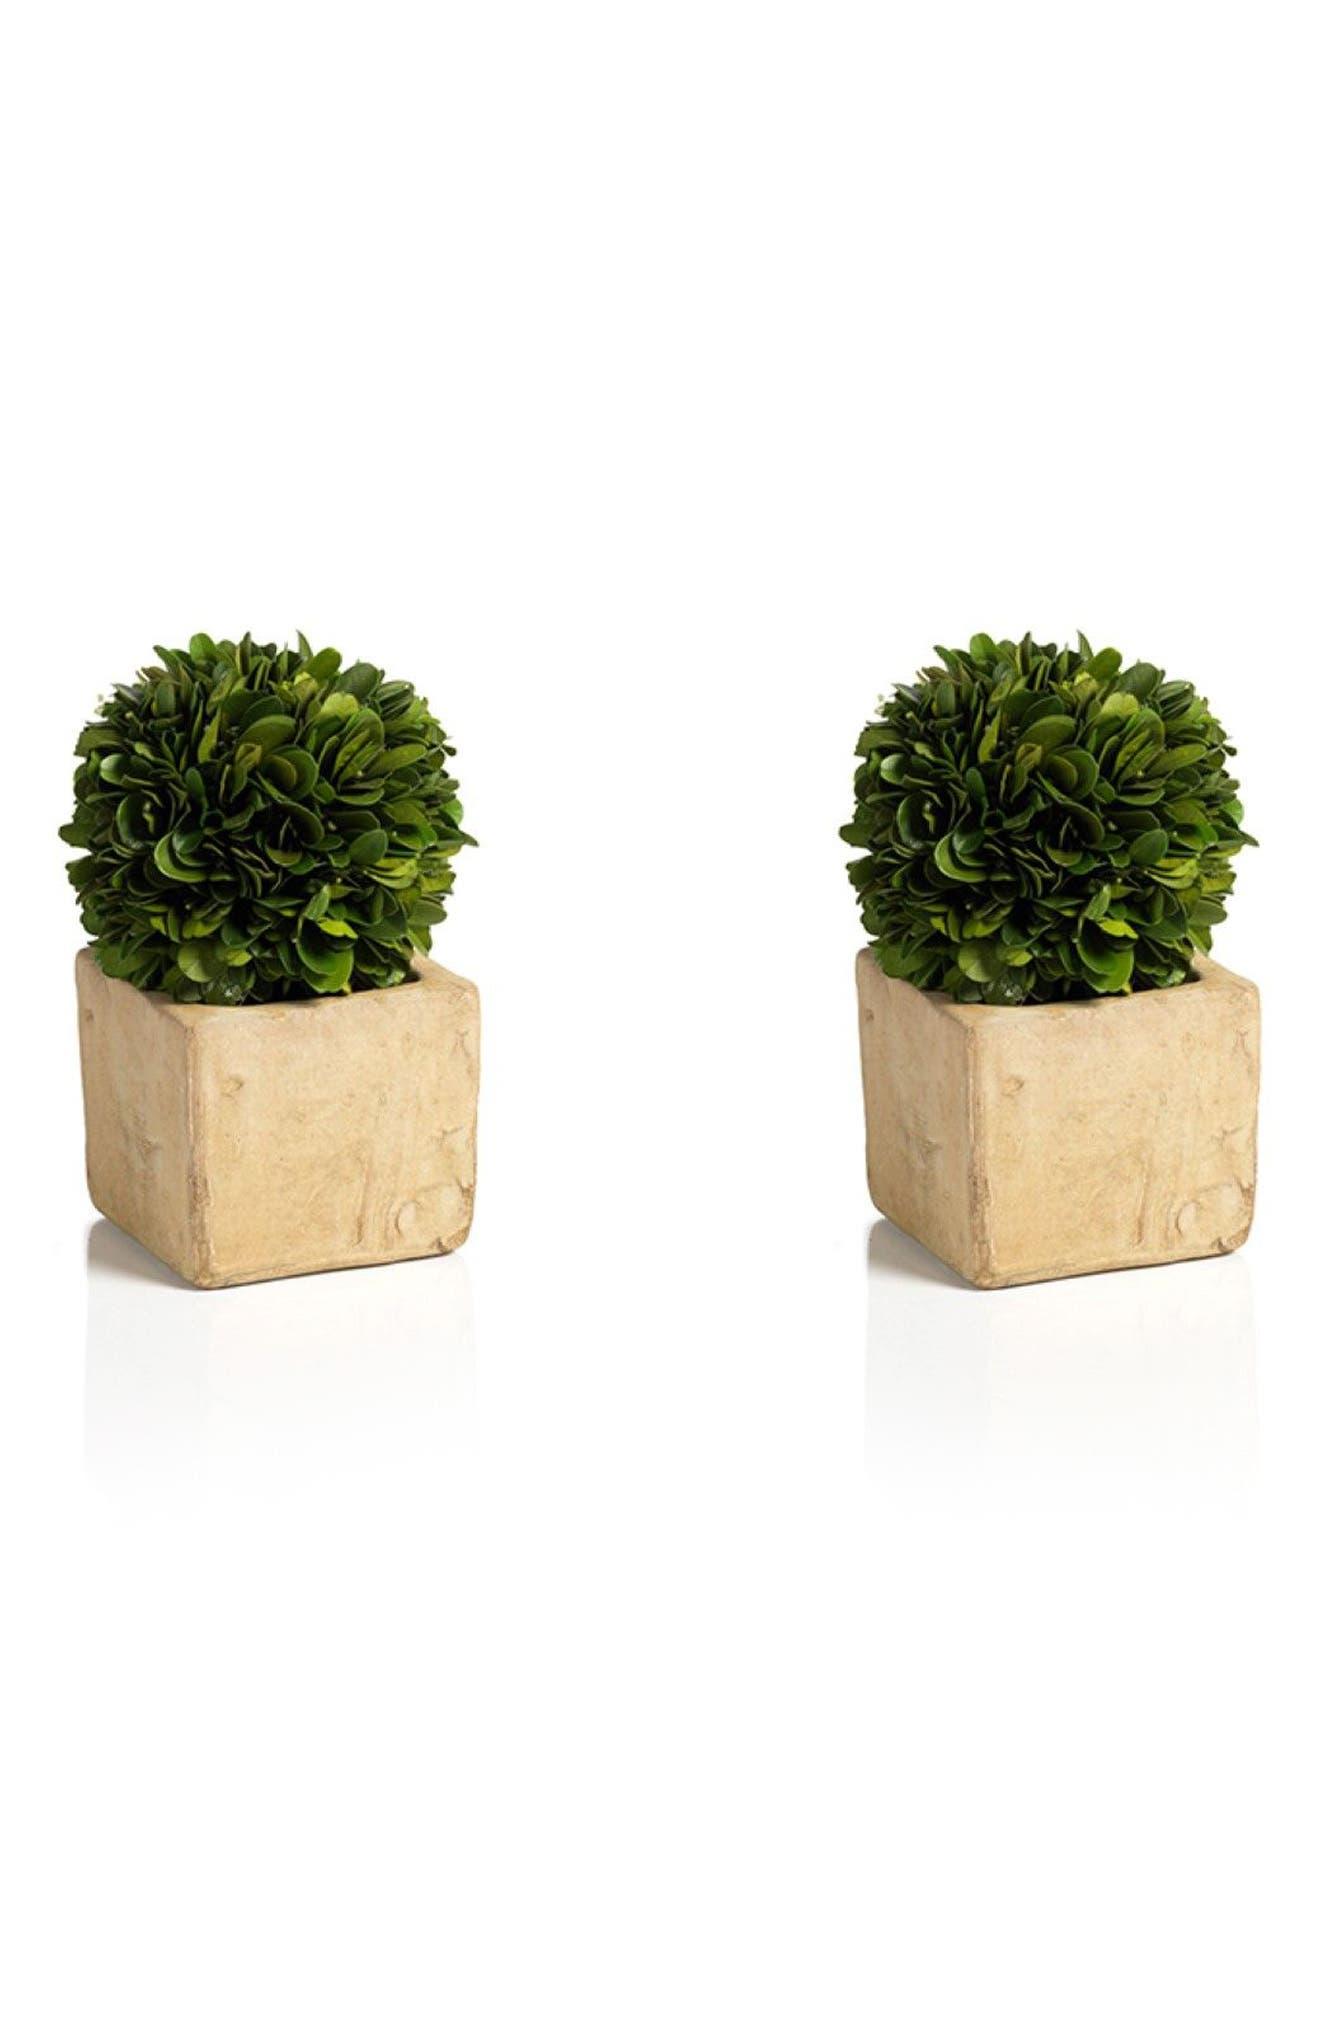 Main Image - Zodax Carina Set of 2 Topiary Decorations